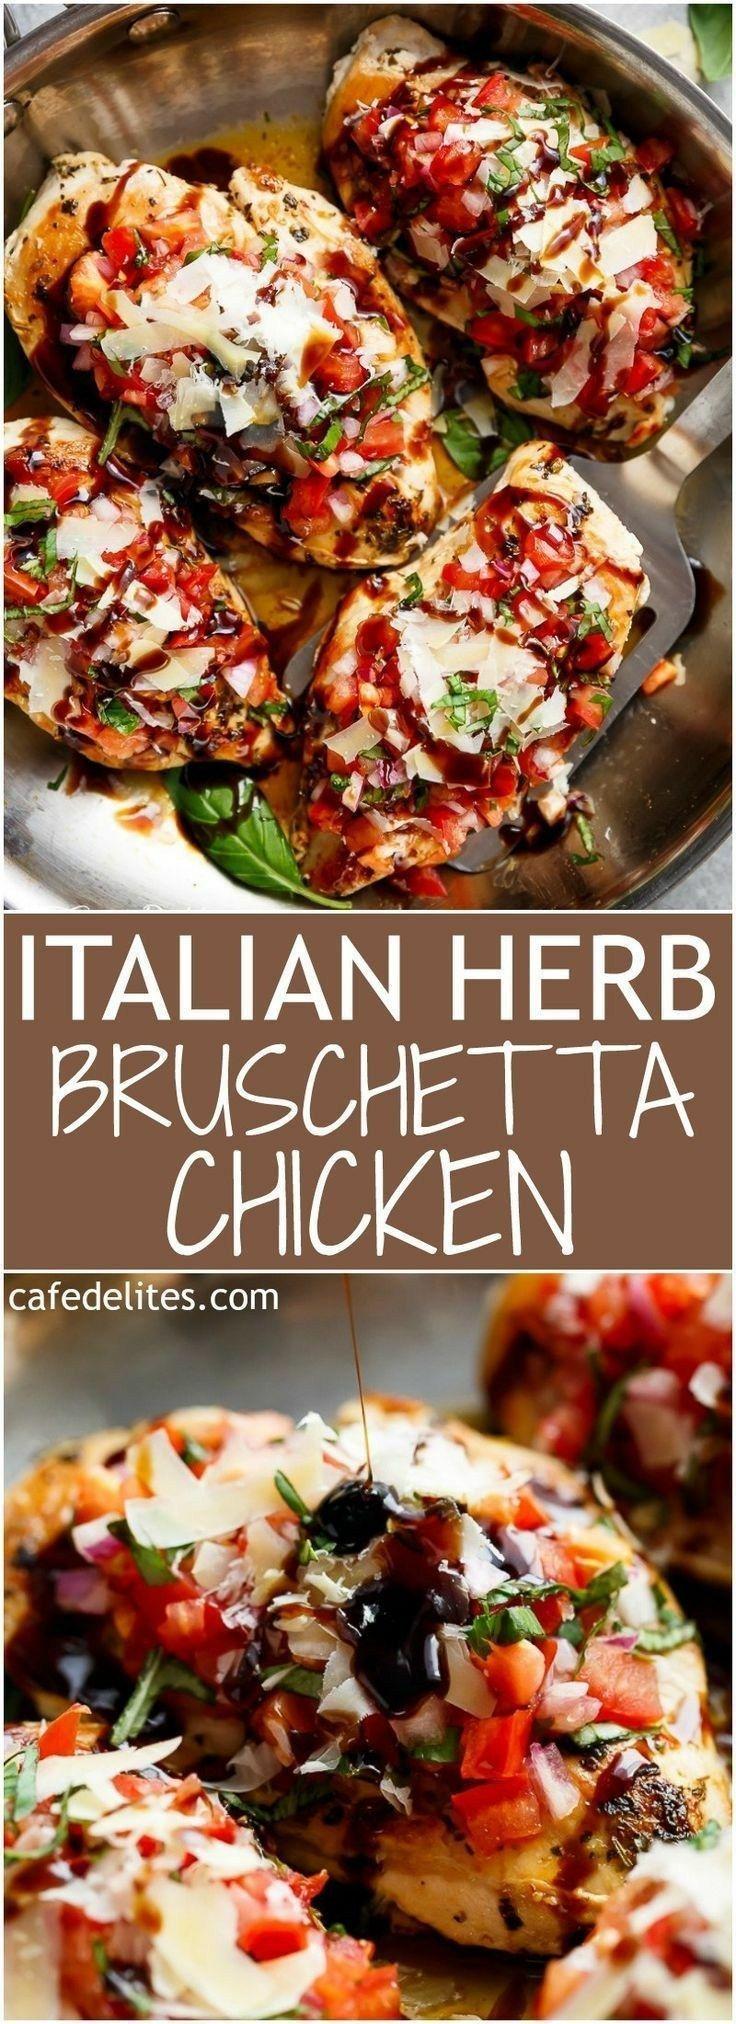 25 Low Carb Keto Italian Recipes